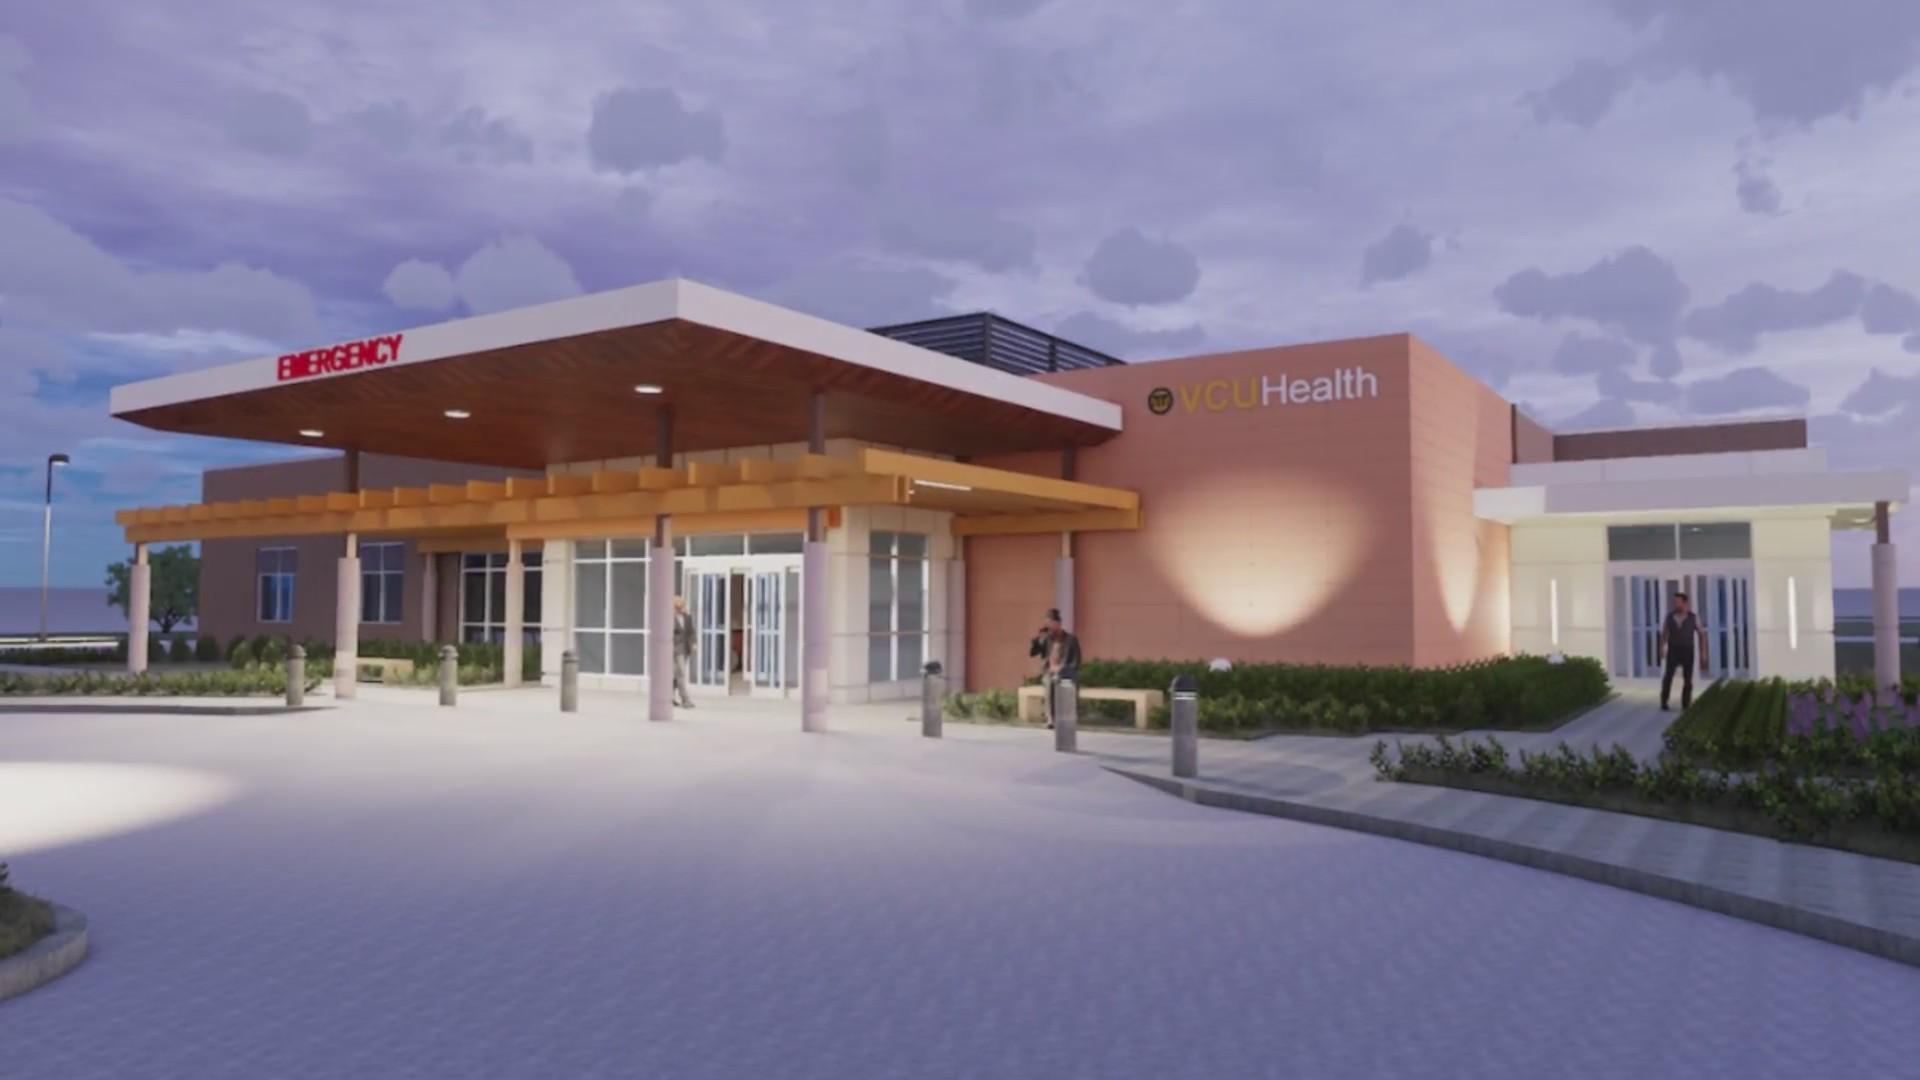 VCU breaks ground on trauma center in New Kent County